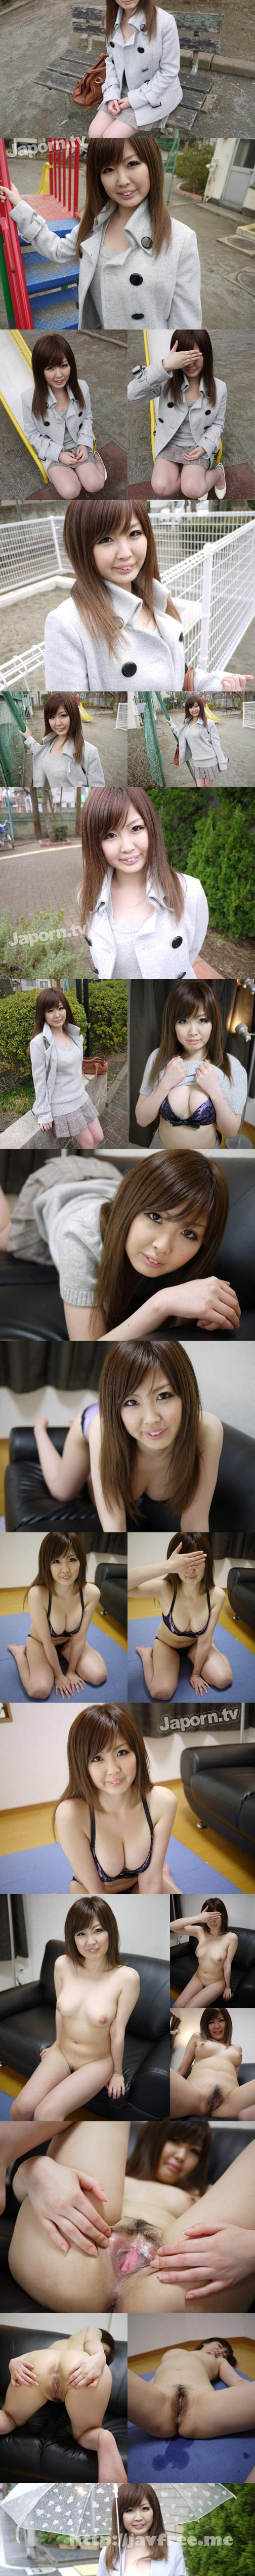 [DSAM 61] 巨乳むすめのご奉仕三昧 : 西野紗江 西野紗江 Sae Nishino DSAM